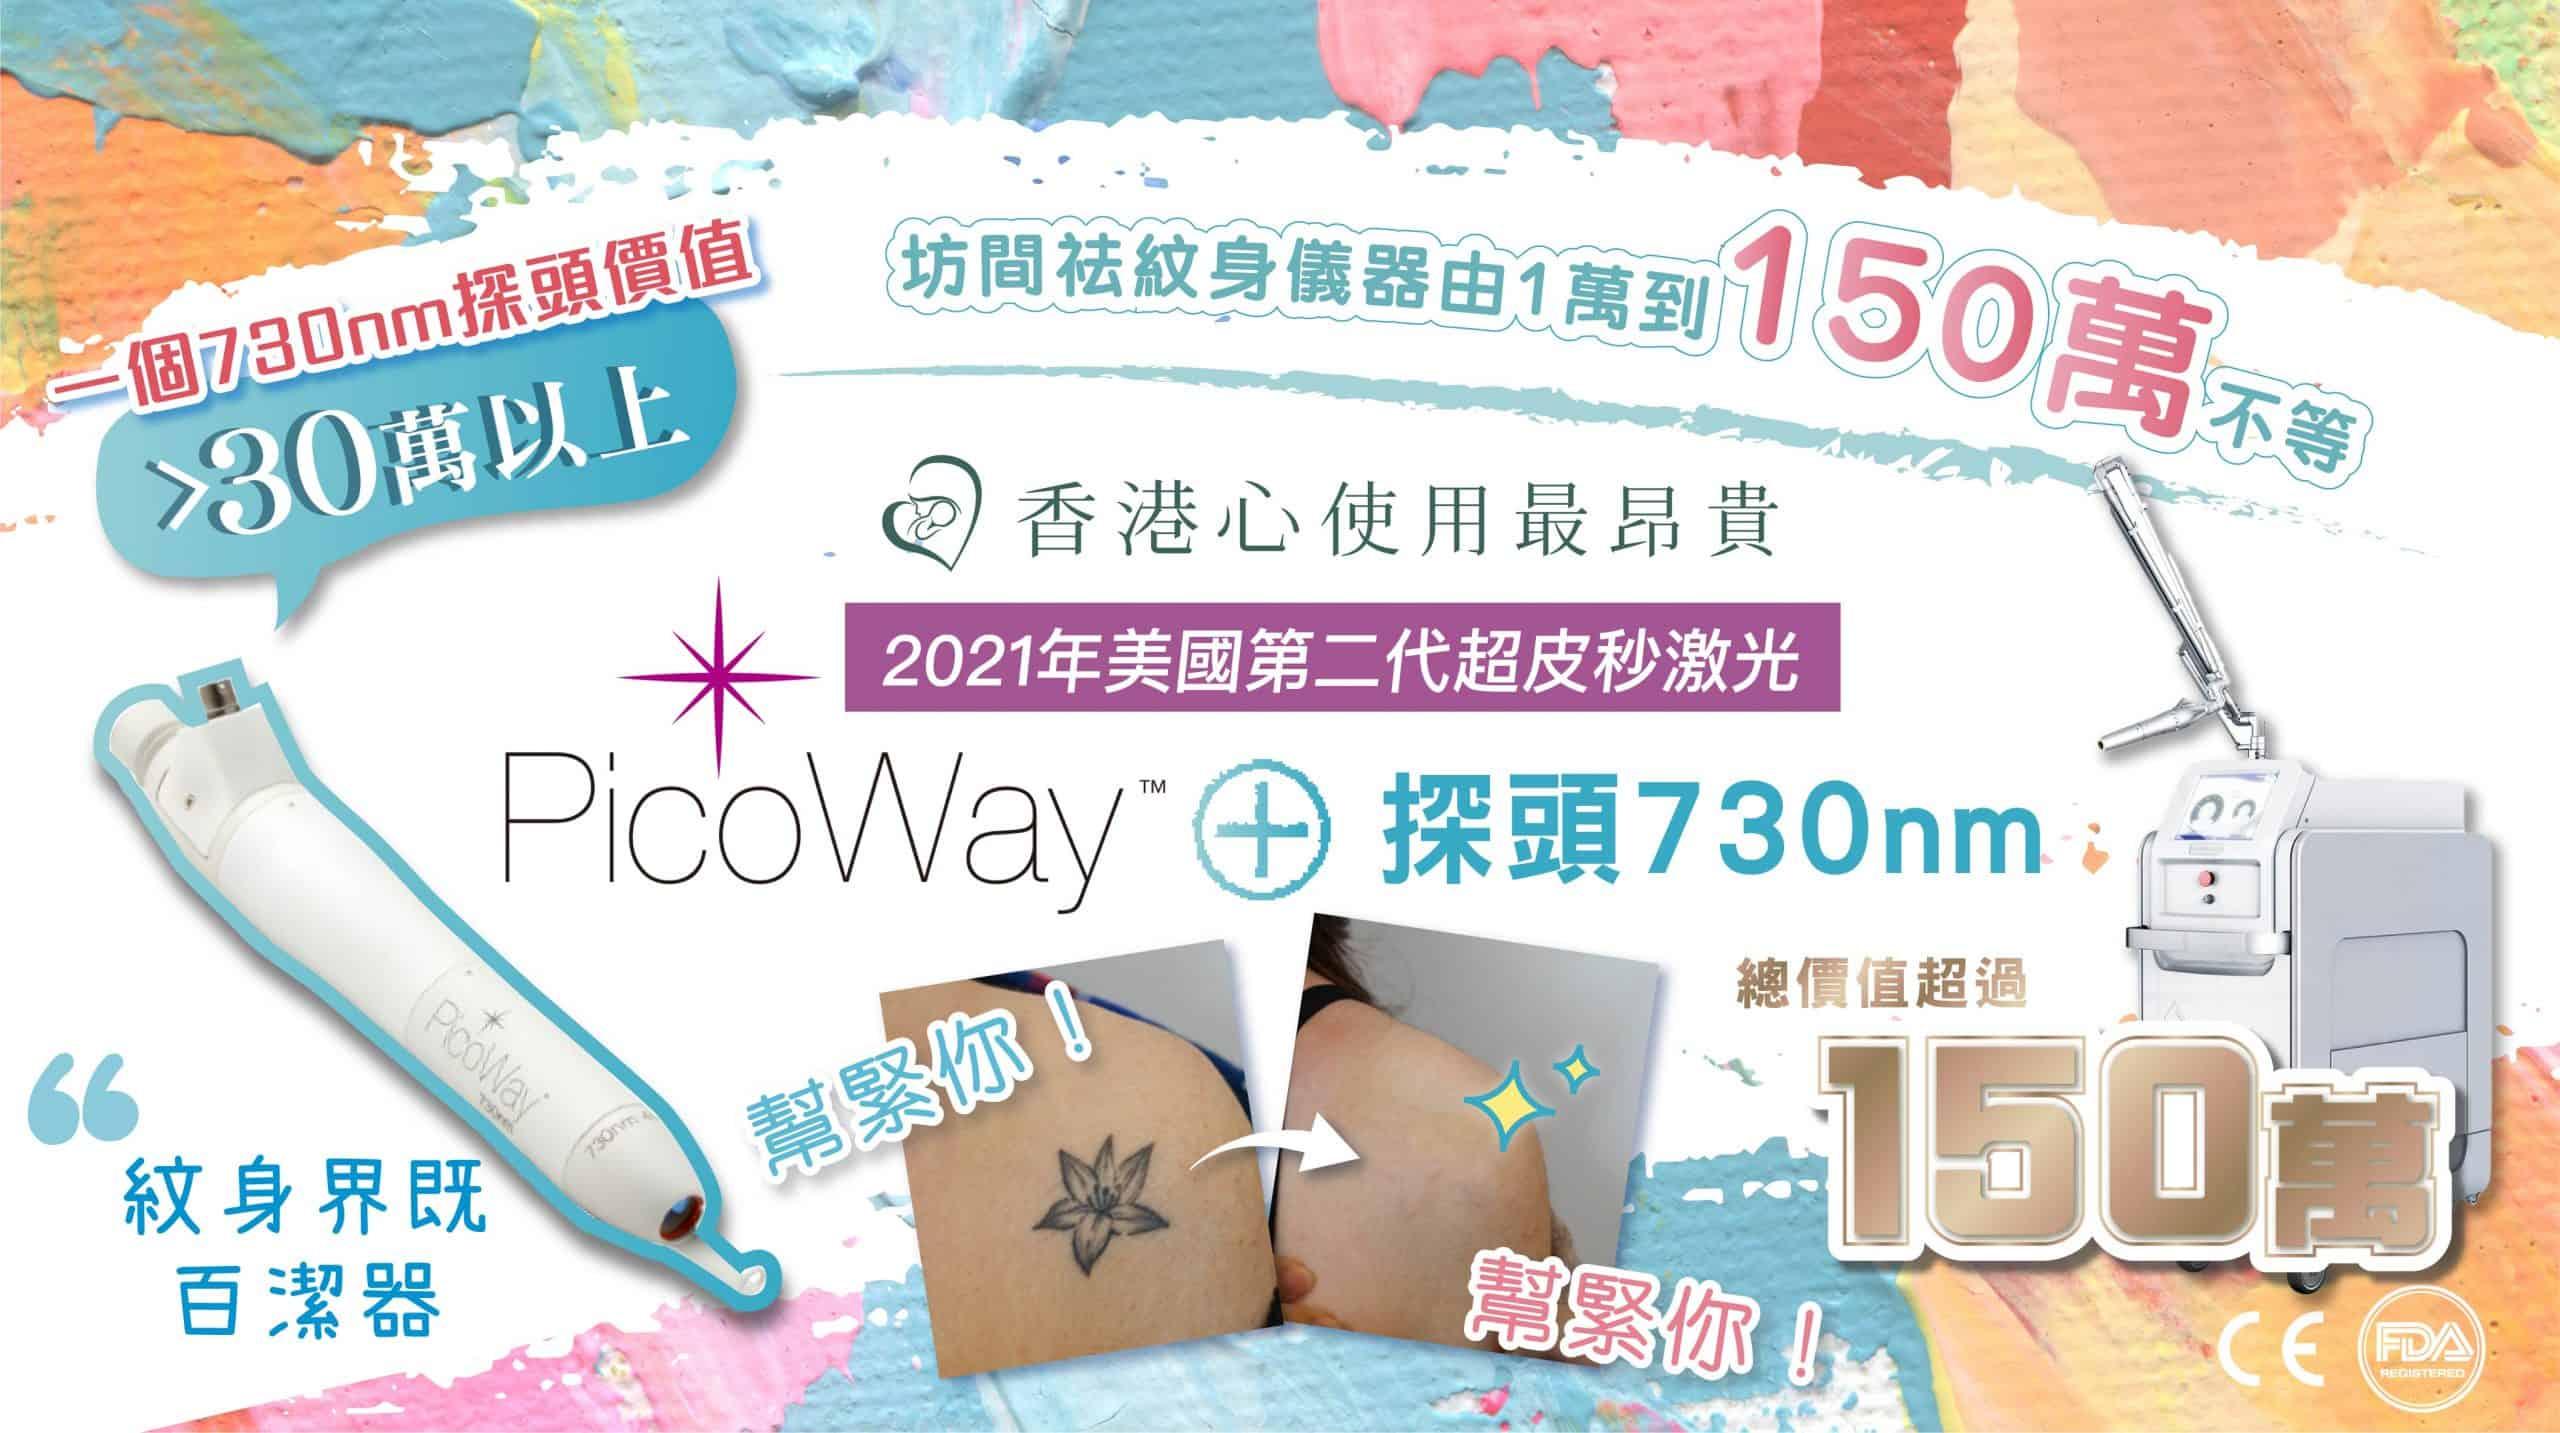 Picoway_tattoo Pico tattoo m 11 1 scaled